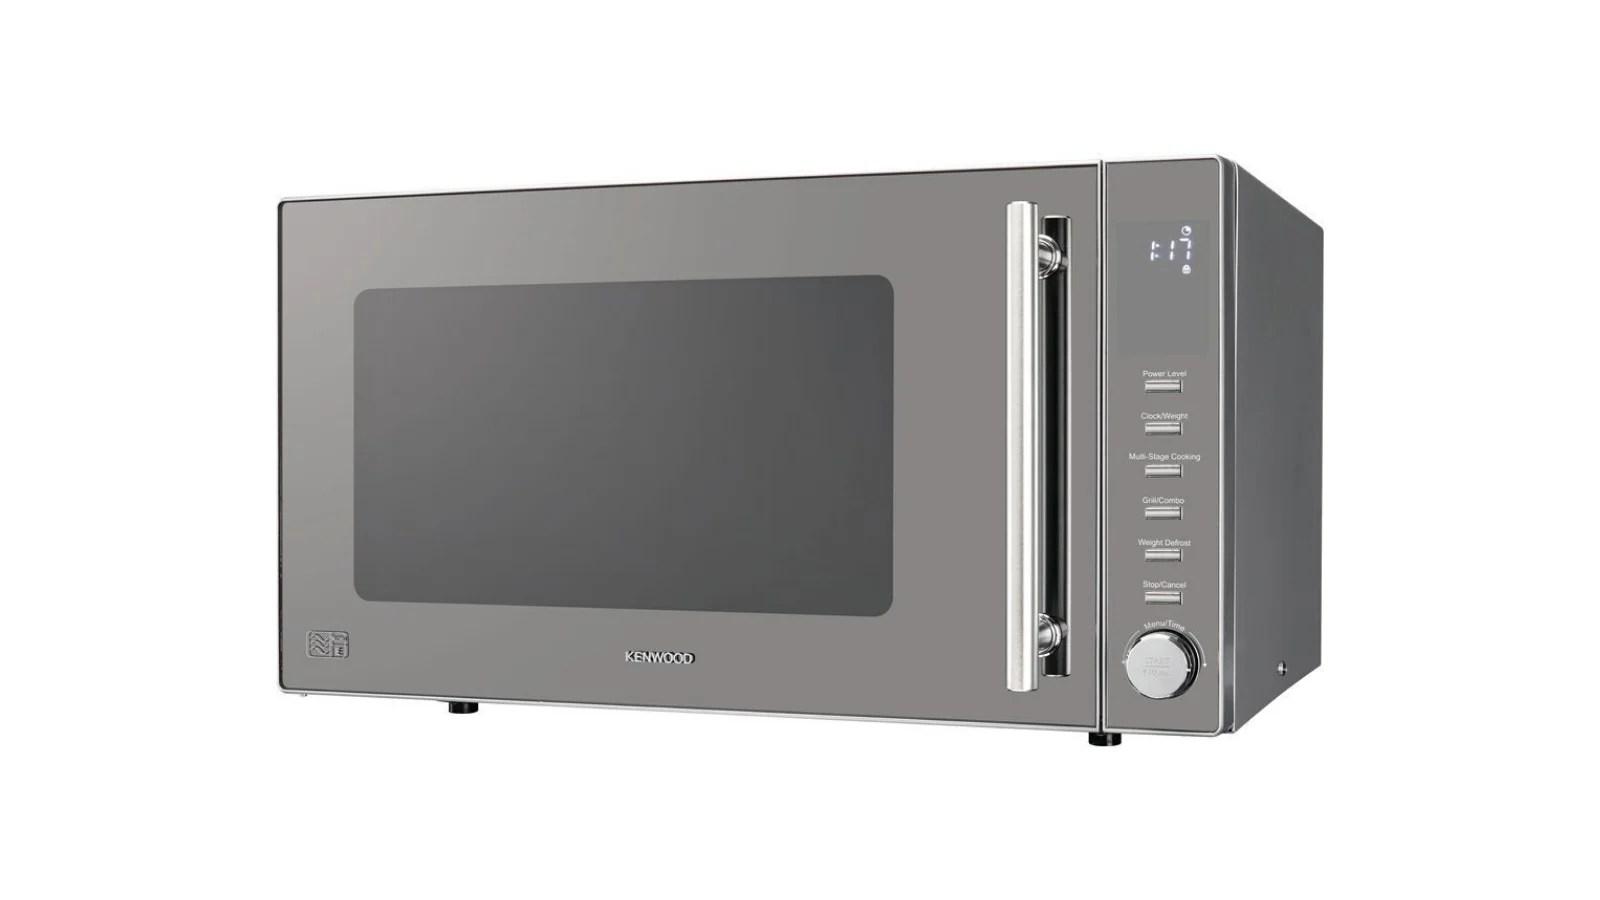 best black friday microwave deals 2020